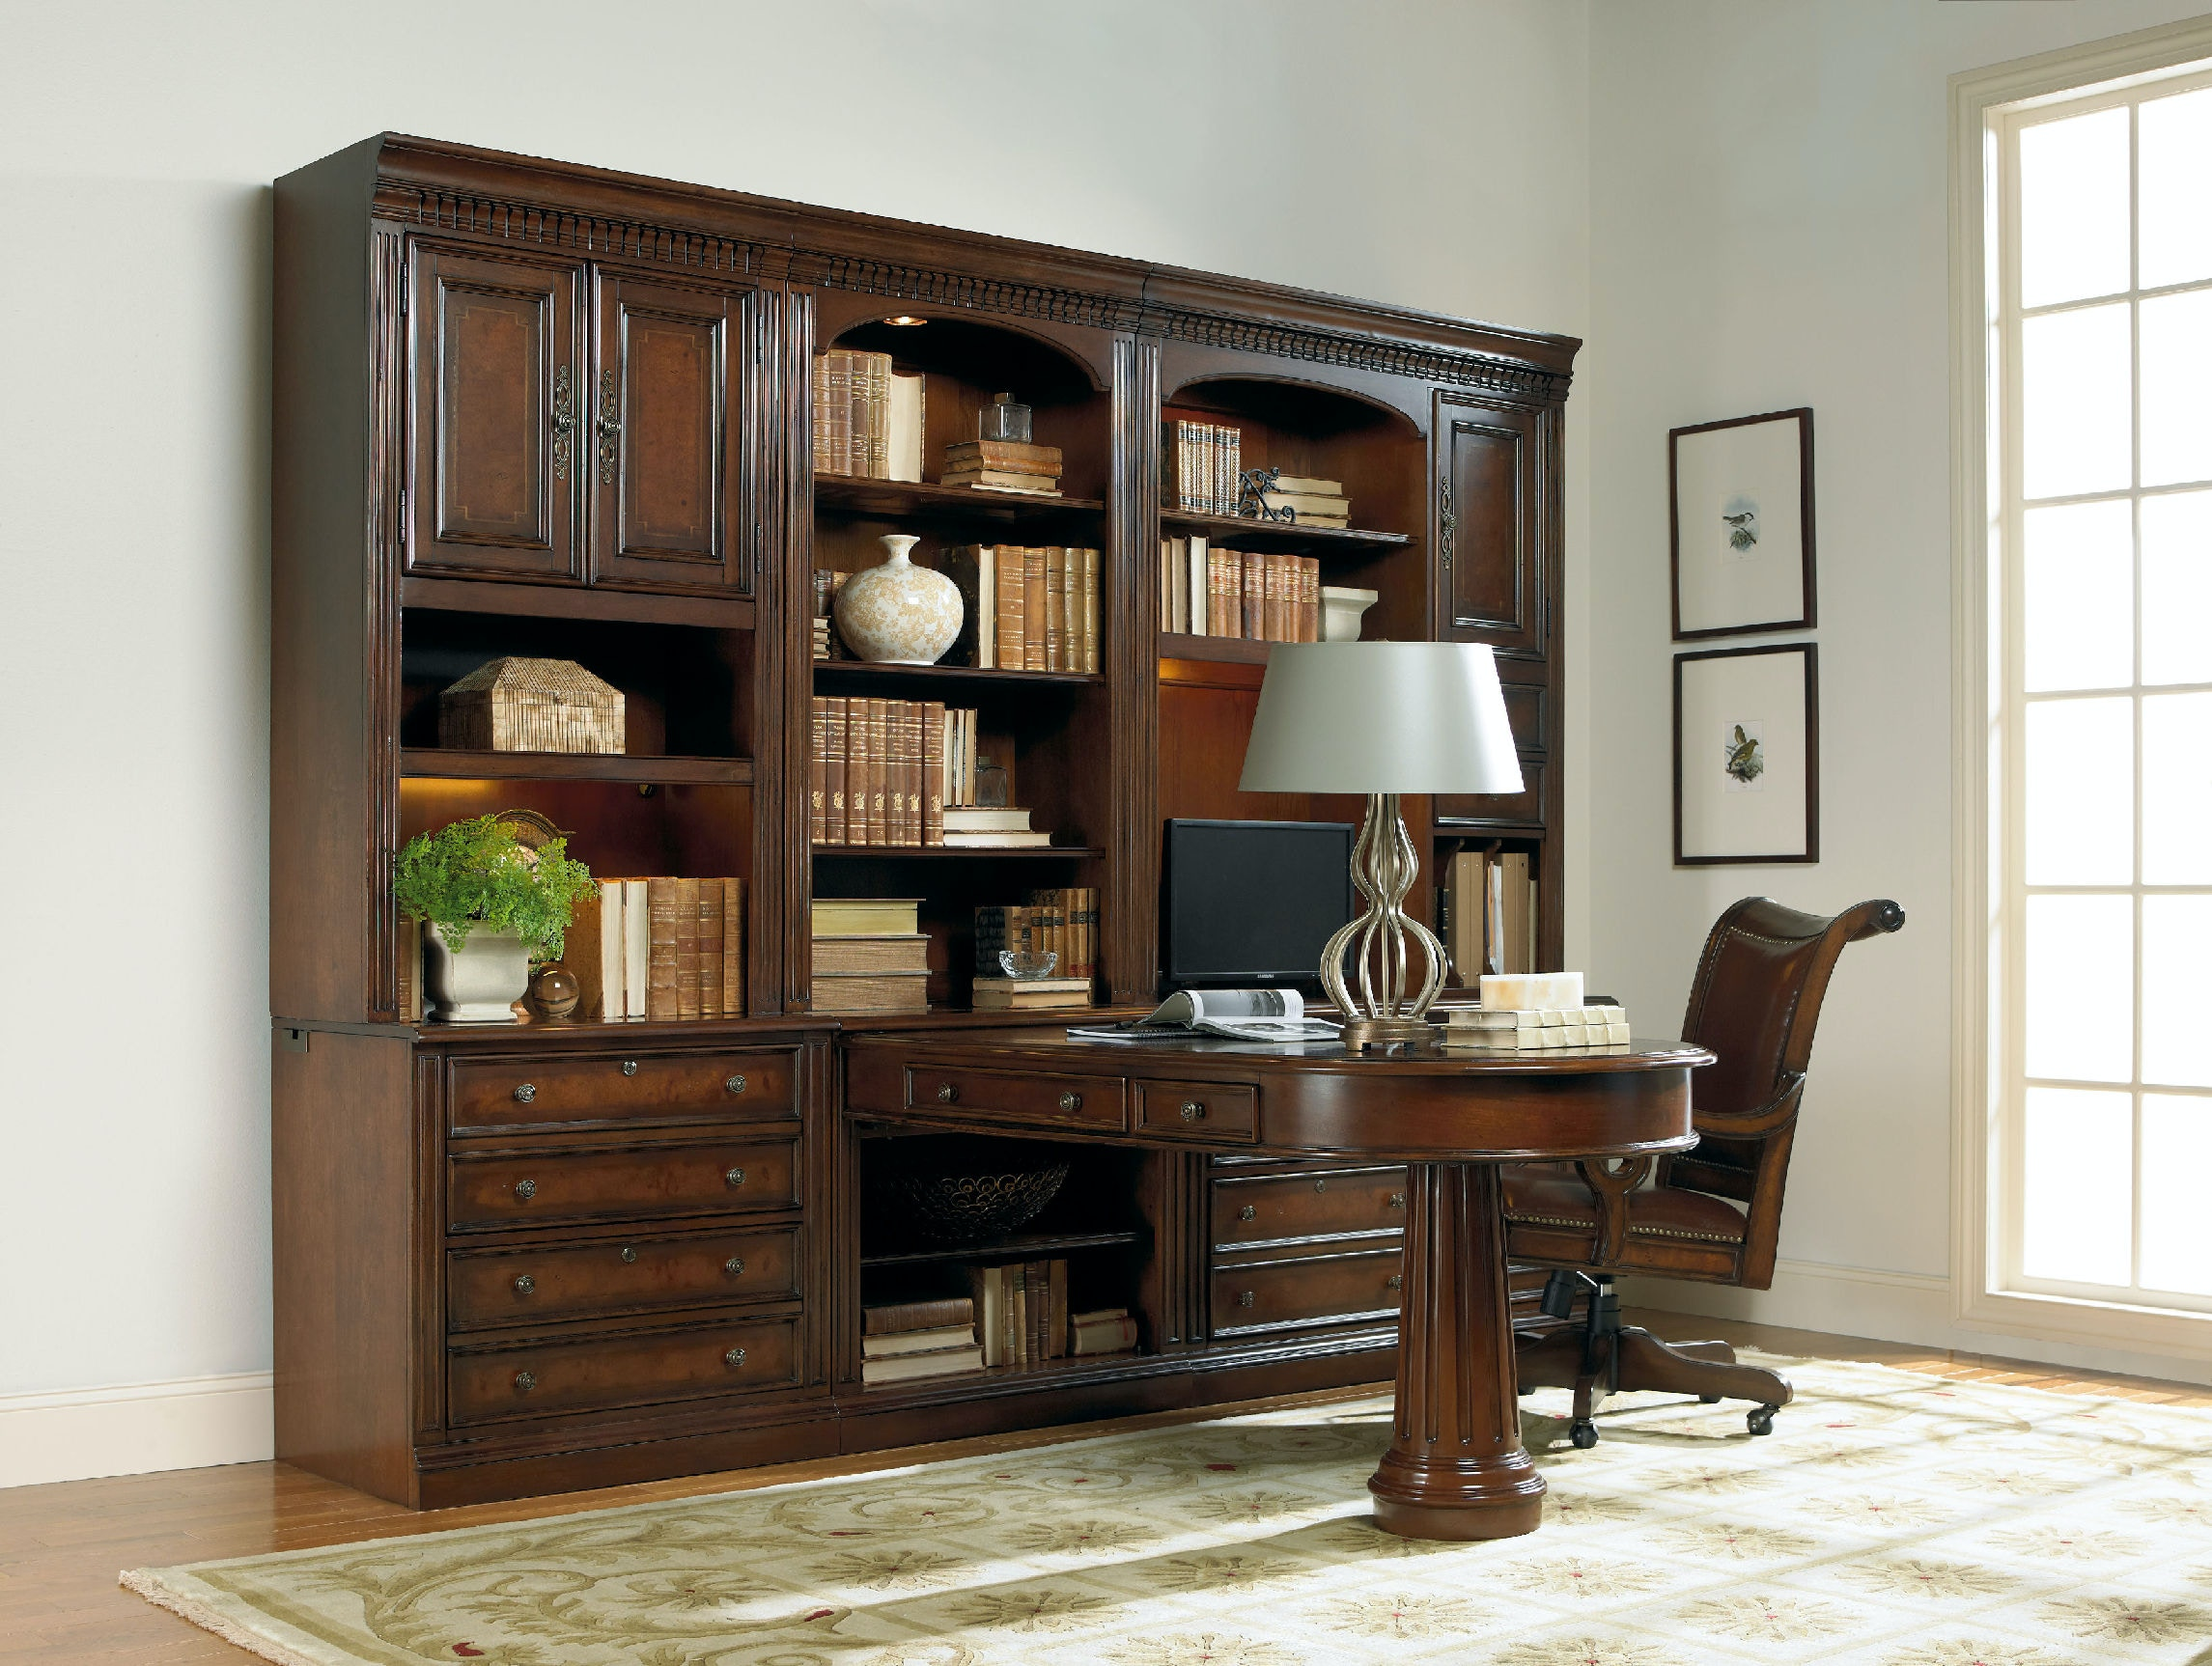 Hooker Furniture European Renaissance II Computer Credenza Hutch 374 10 435